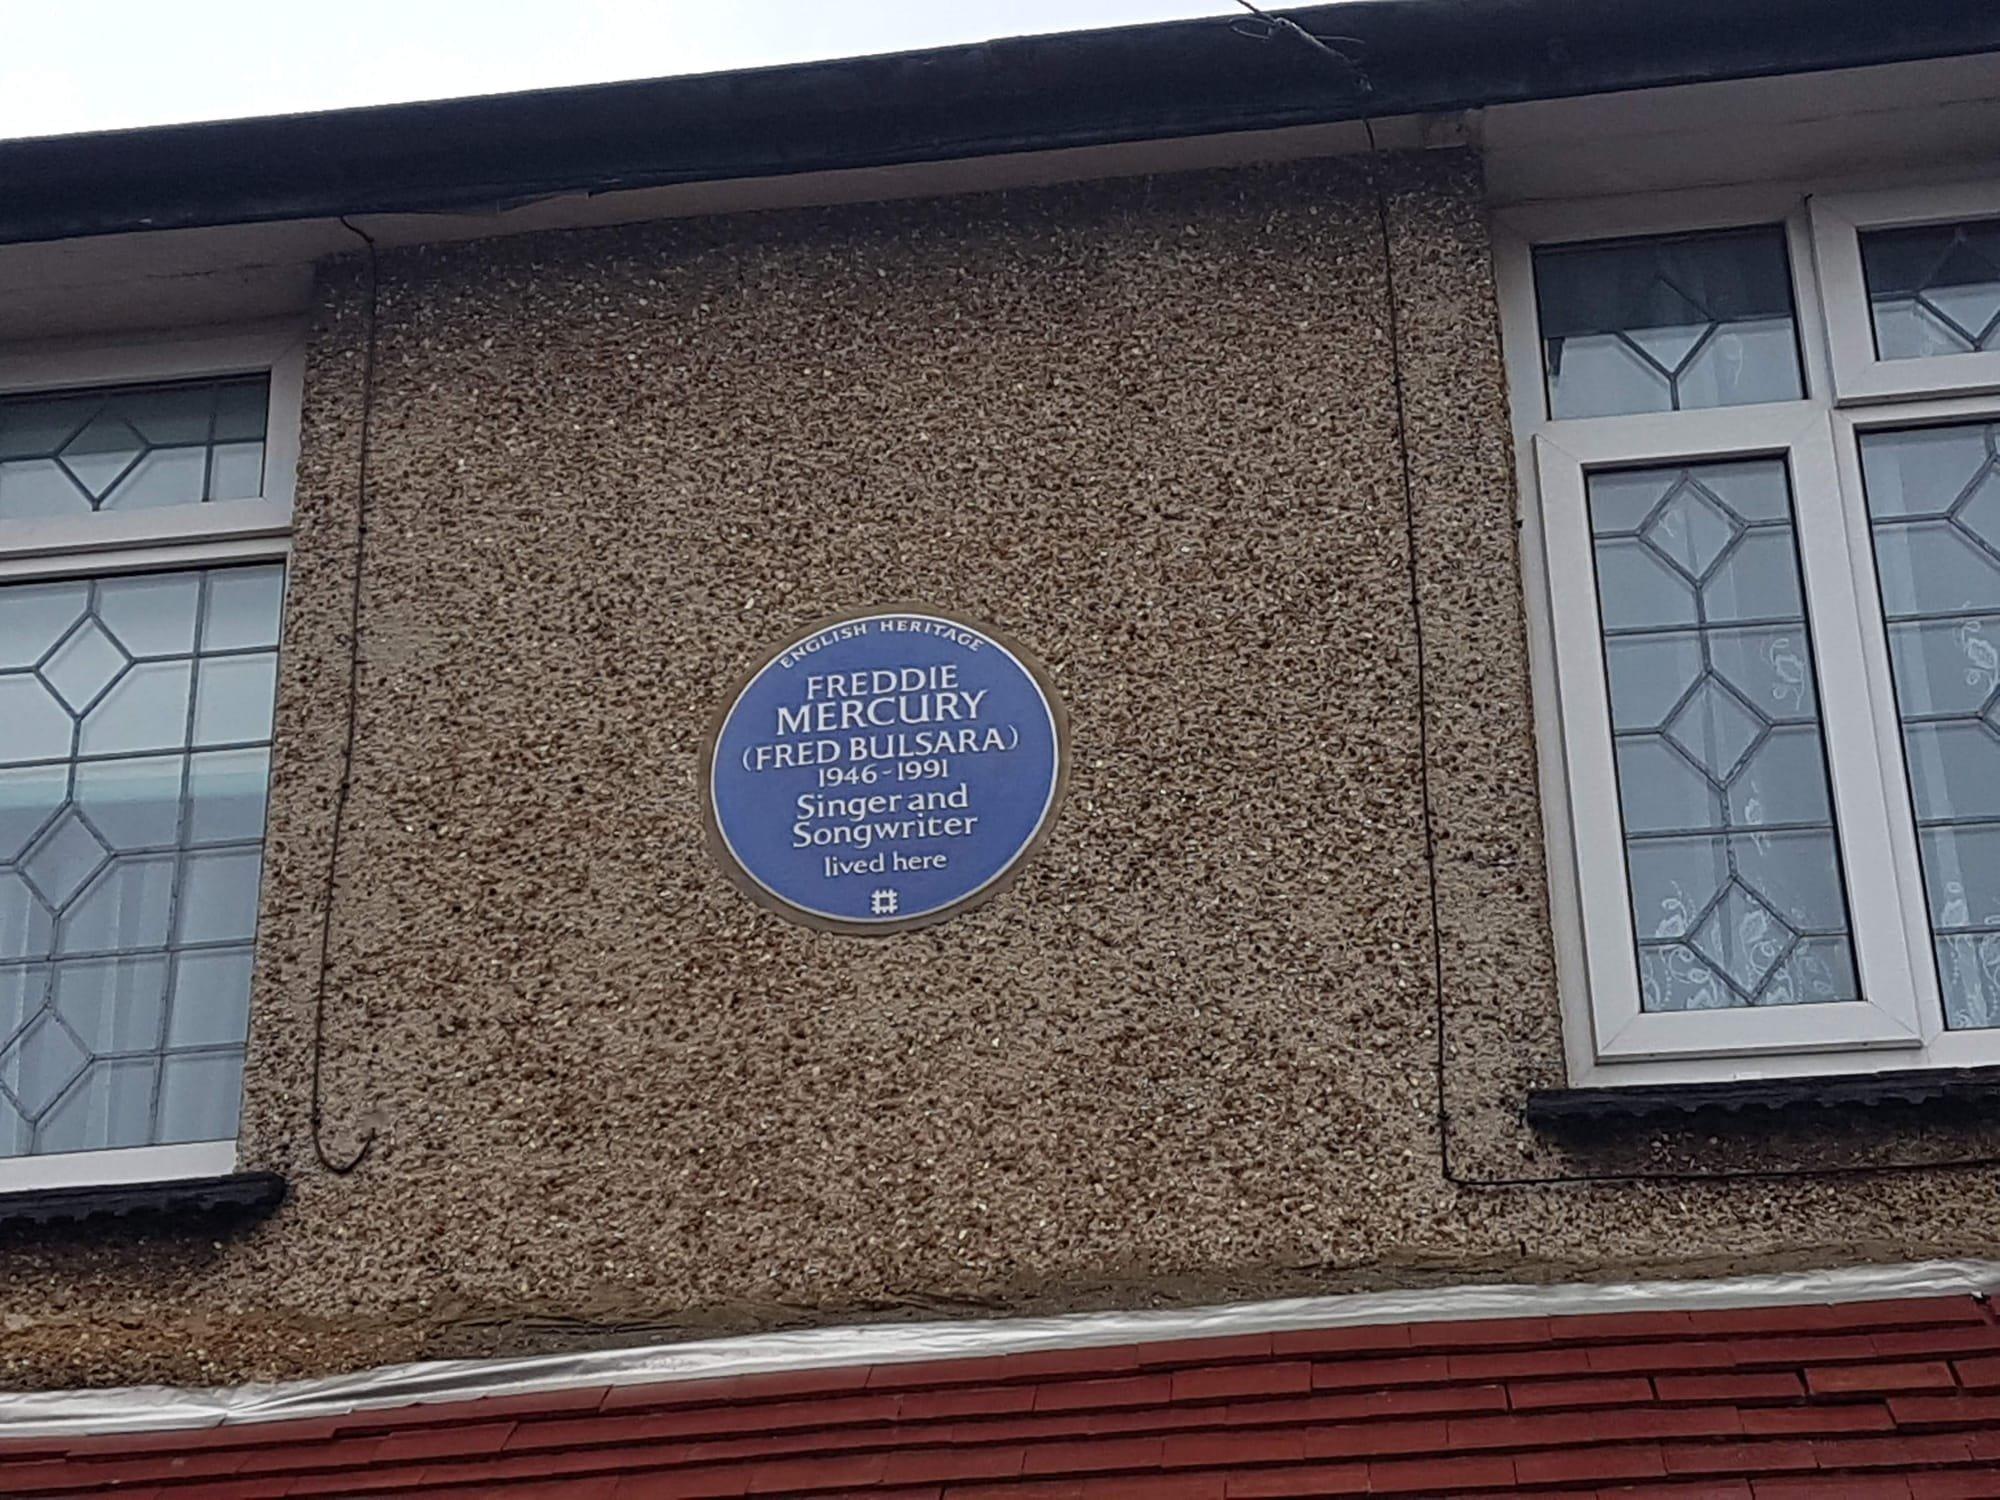 feltham blue plaque